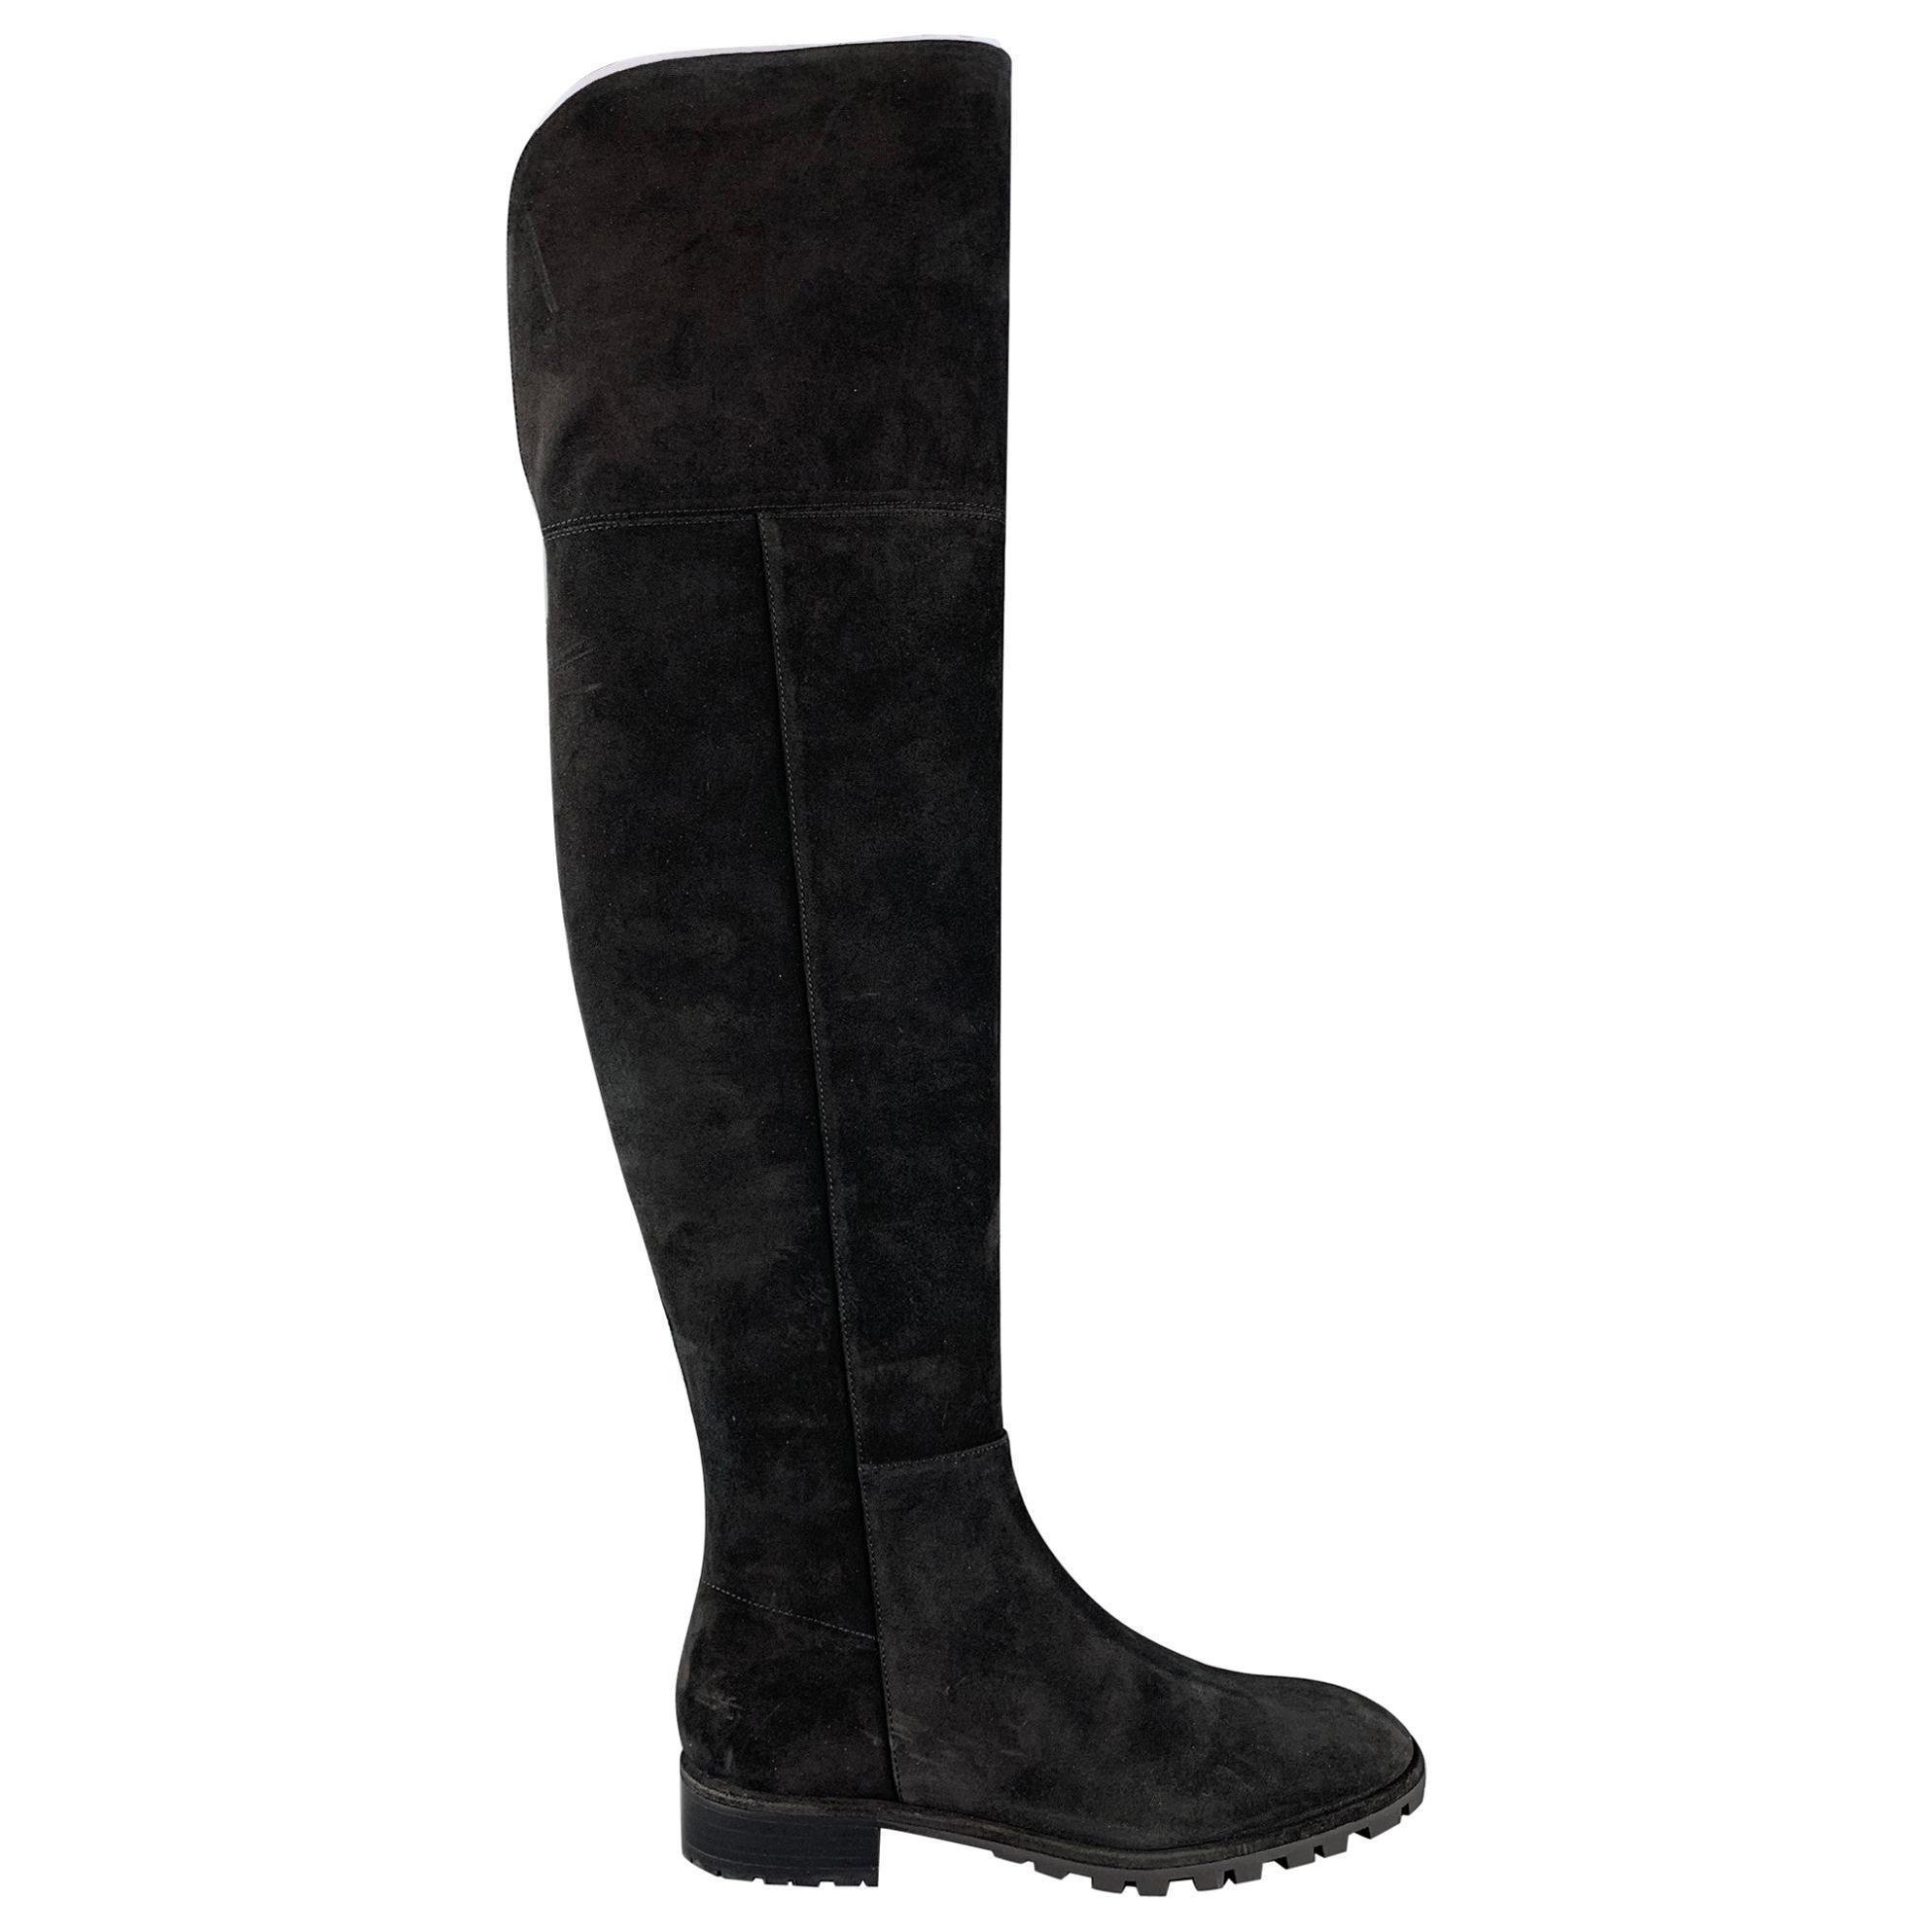 STUART WEITZMAN Amber Size 10 Black Suede Boots